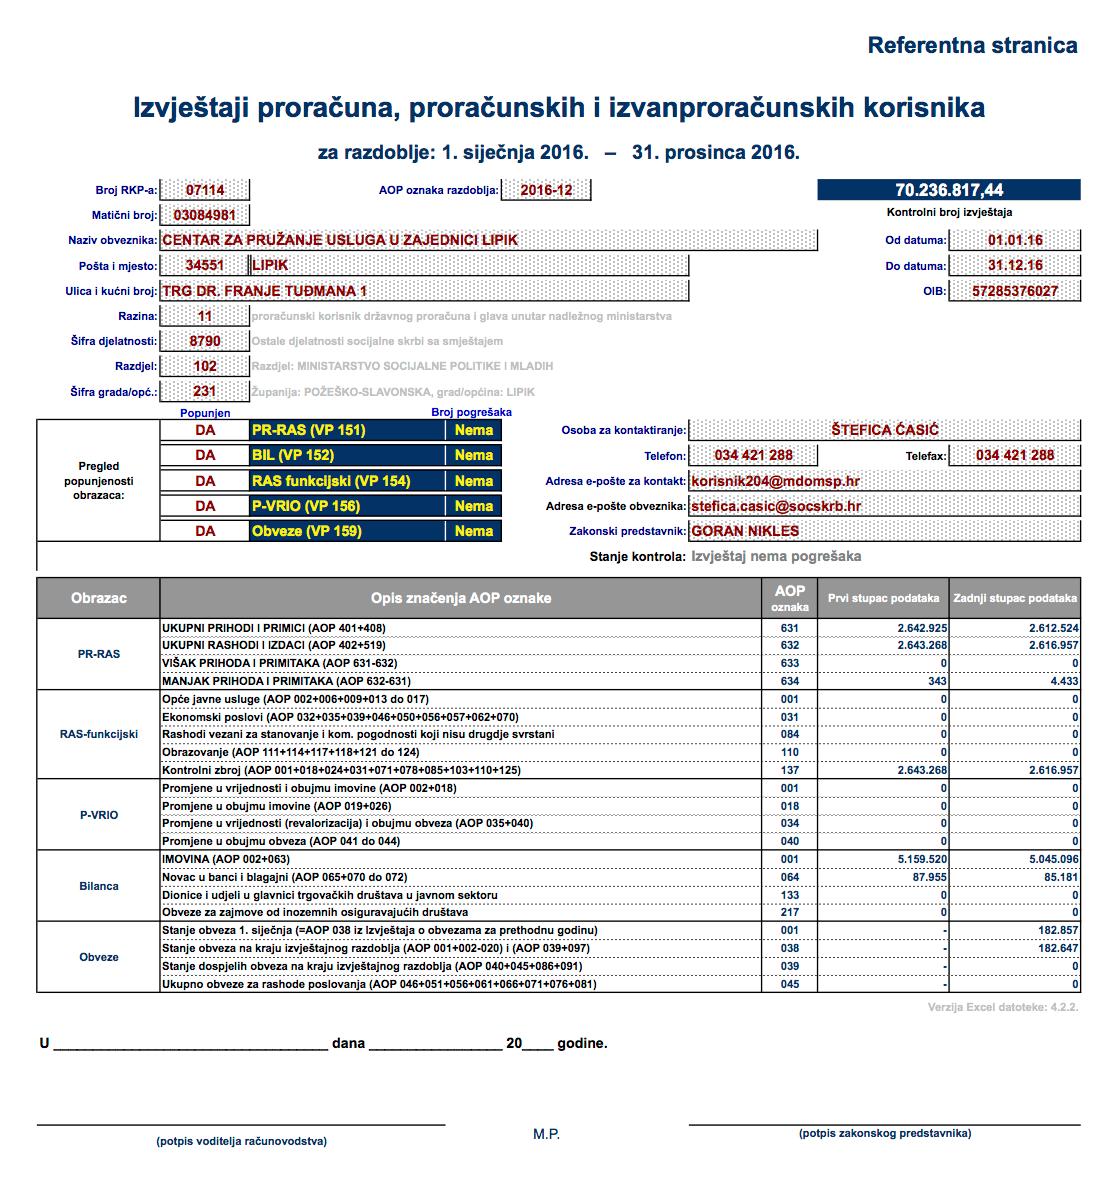 referentna-stranica-2016